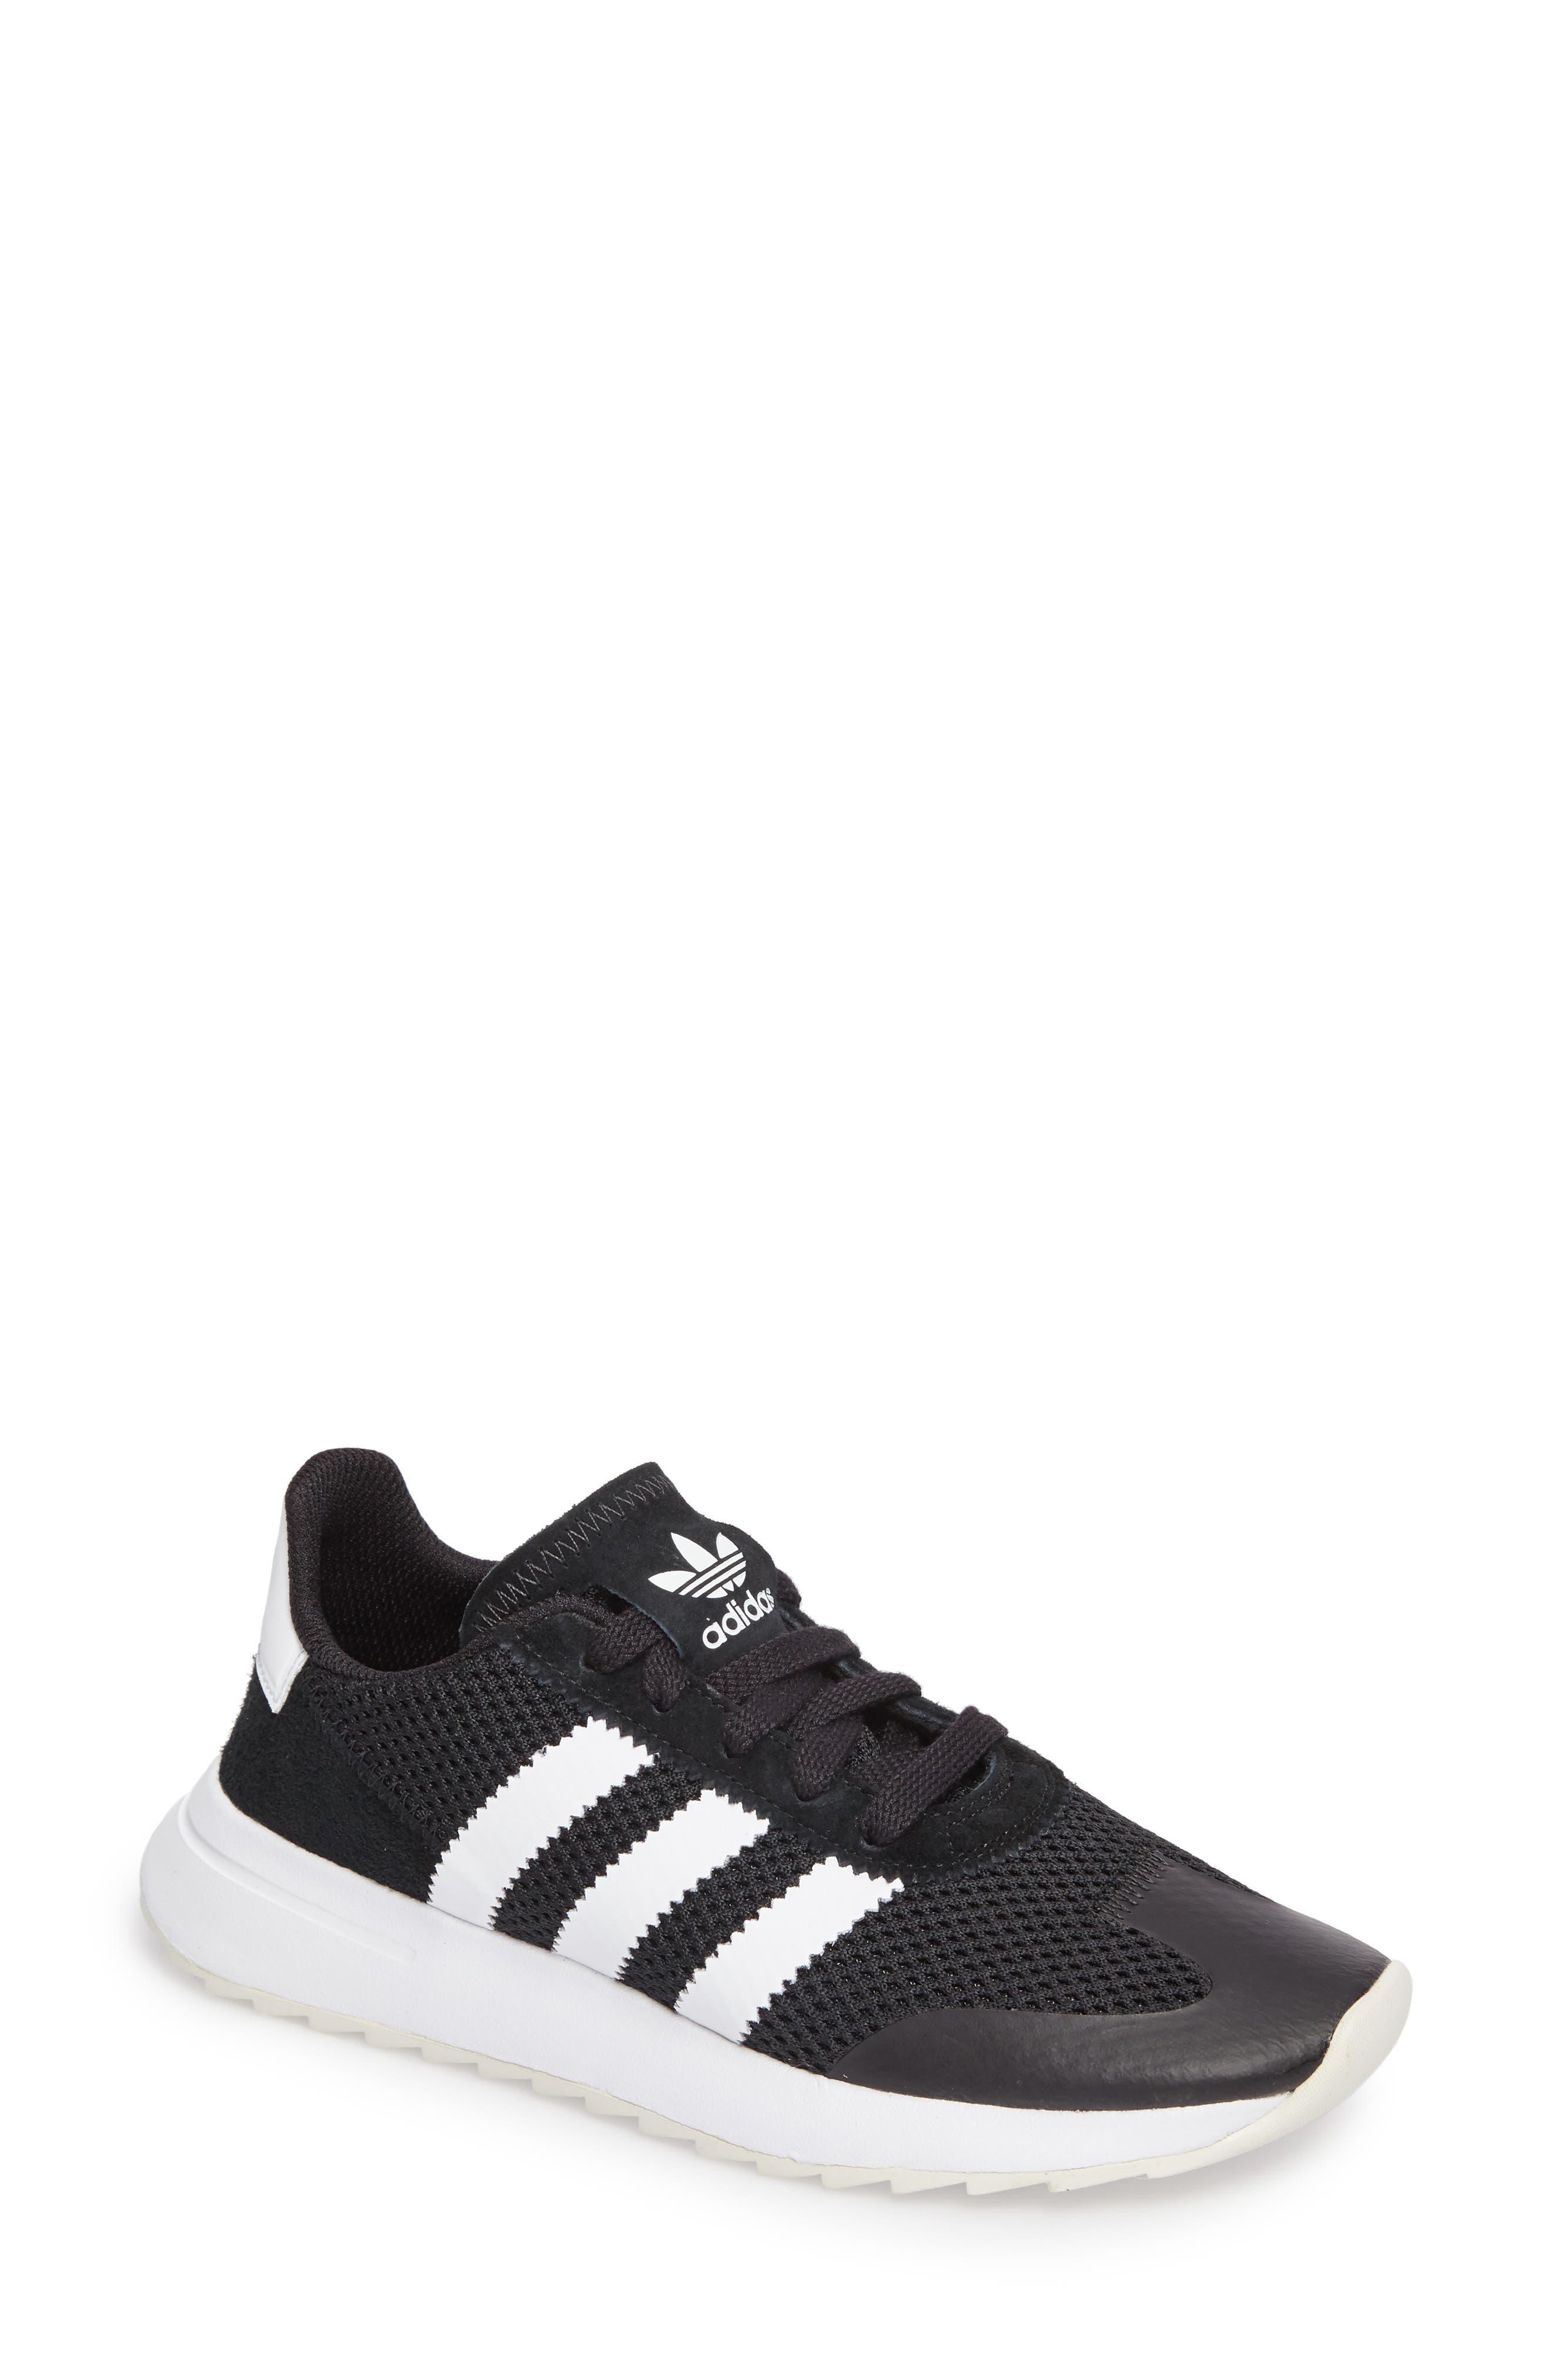 ADIDAS Flashback Sneaker, Main, color, 001